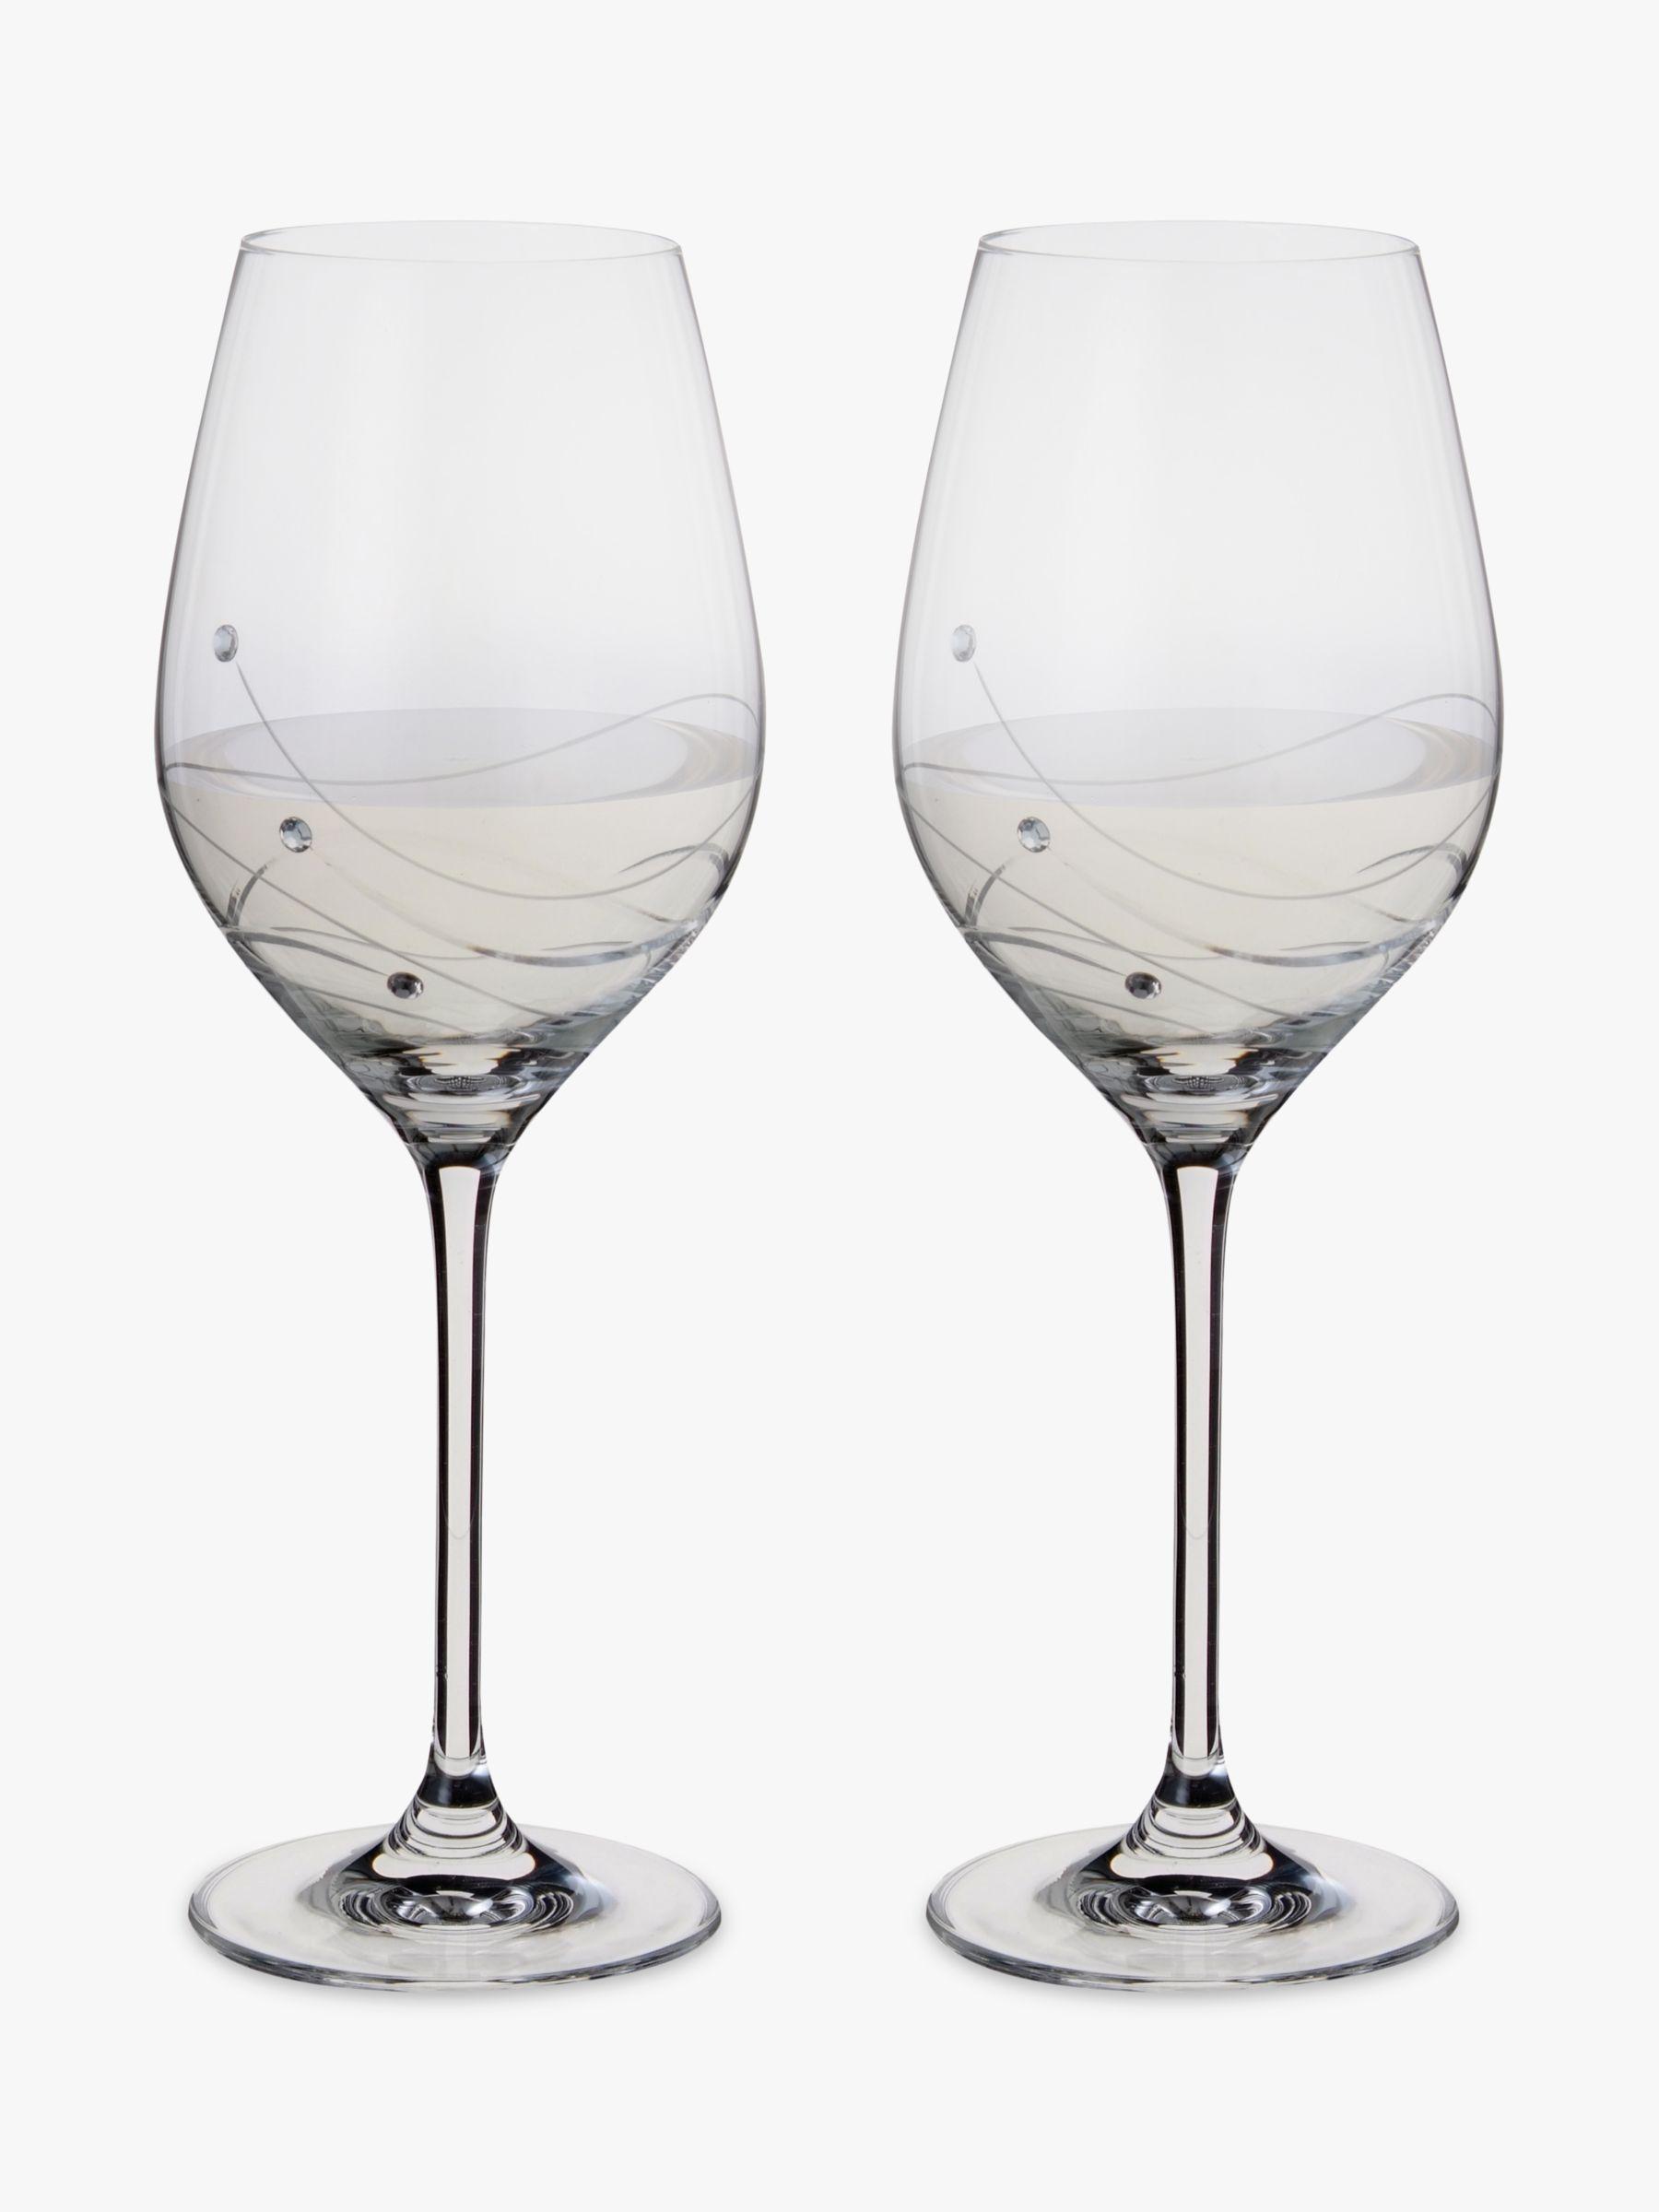 Dartington Crystal Dartington Crystal Glitz Wine Glasses, 330ml, Set of 2, Clear